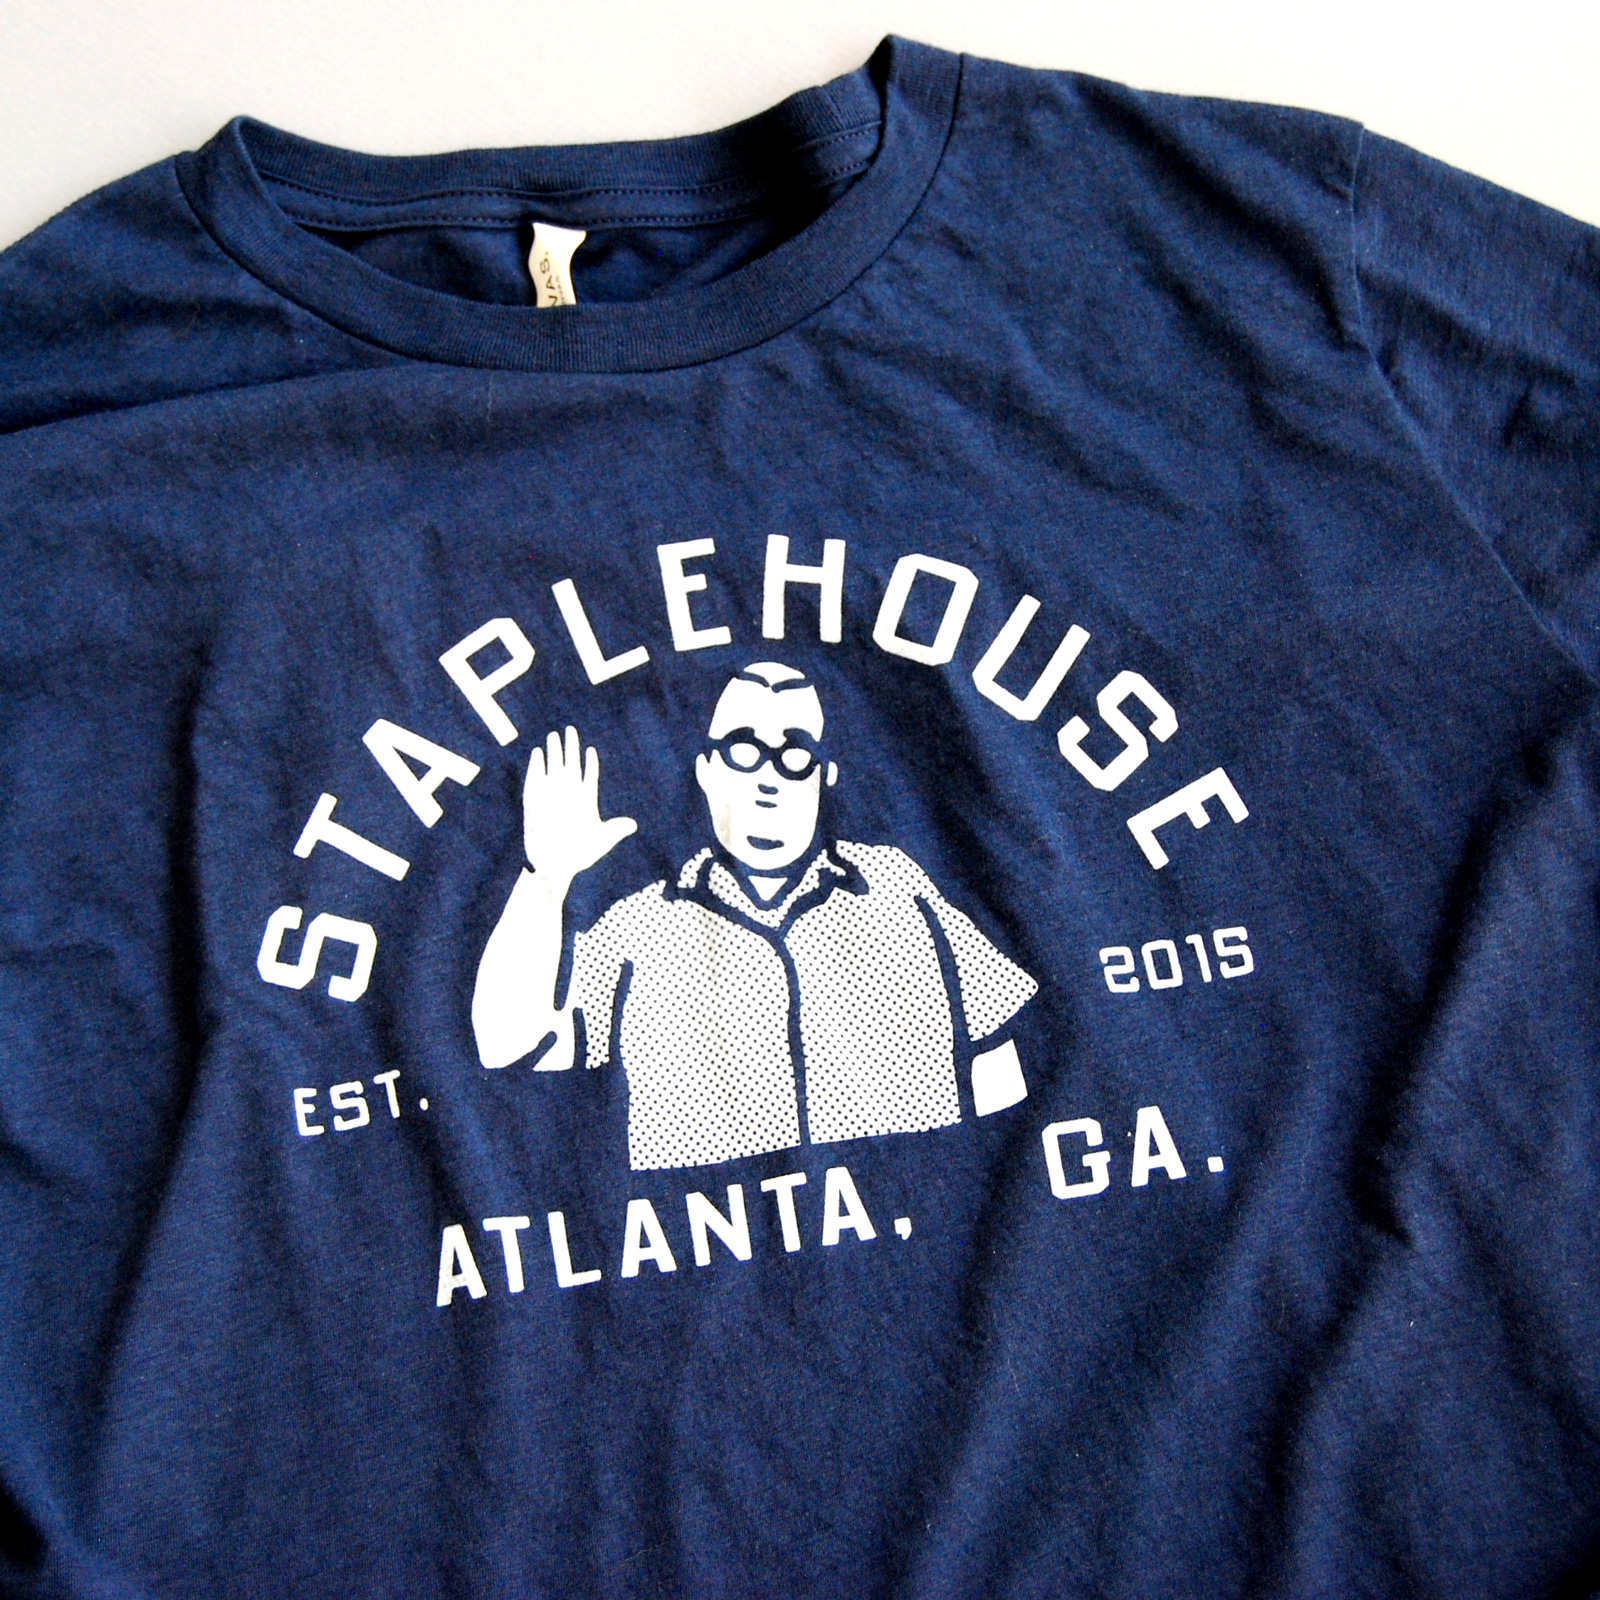 staplehouse_t-shirt_john-candy_01.jpg